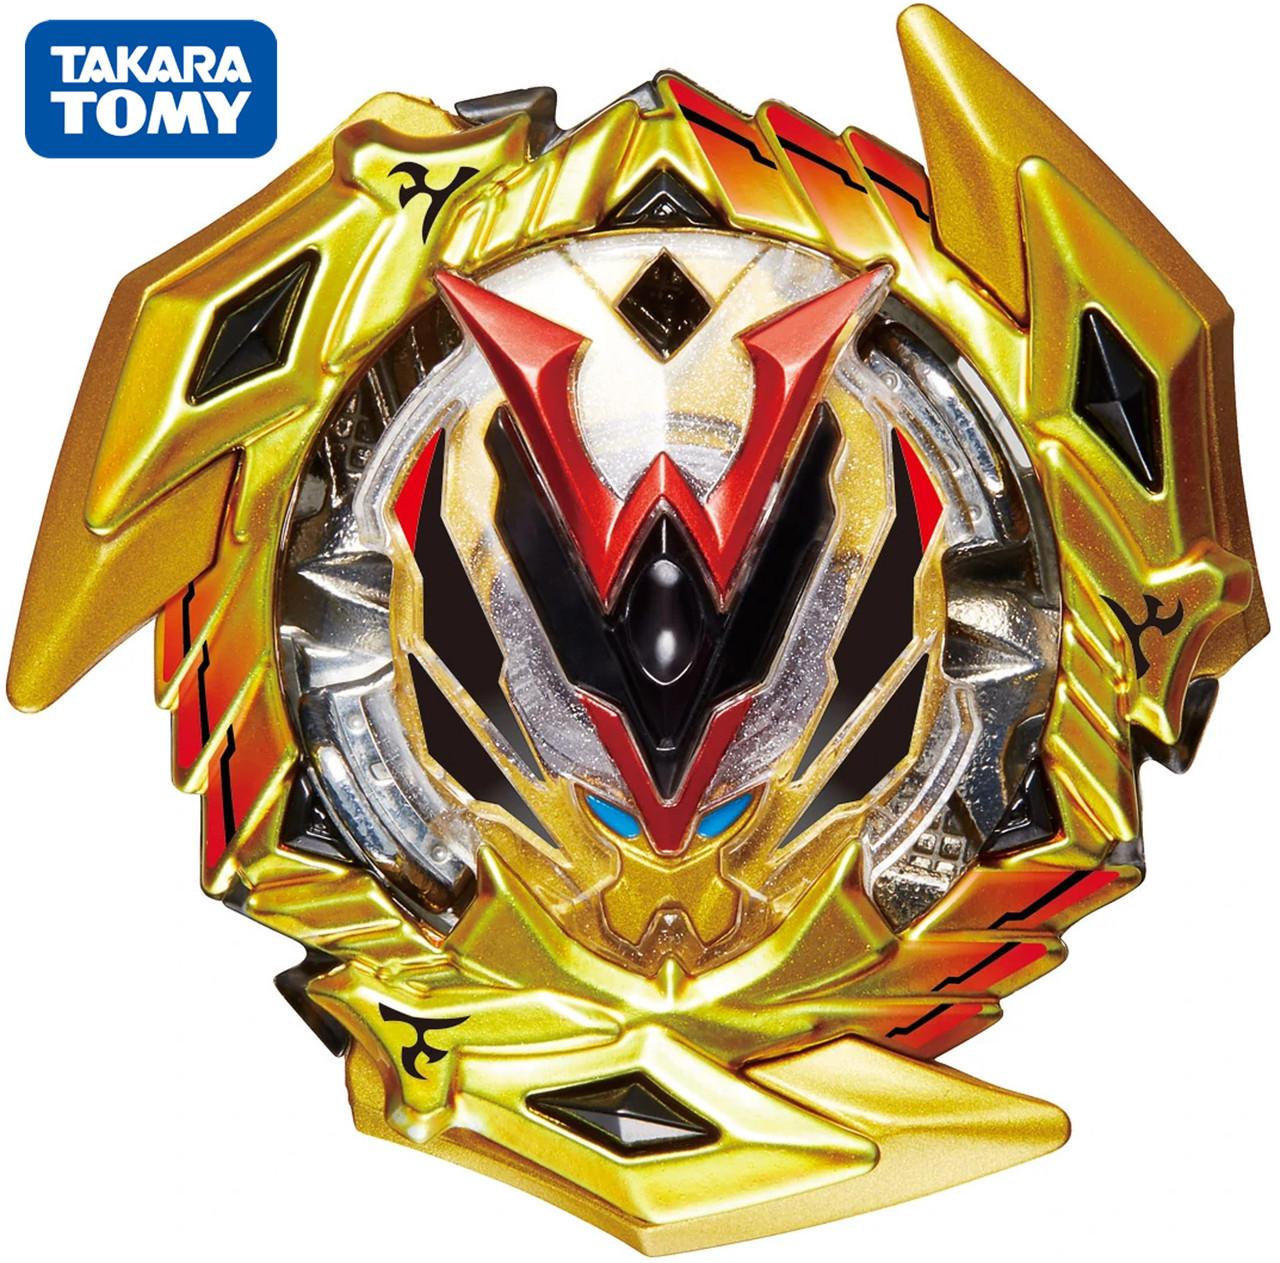 Takara Tomy Beyblade Burst Booster B-132 #01 Winning Valkyrie 1/' Operate